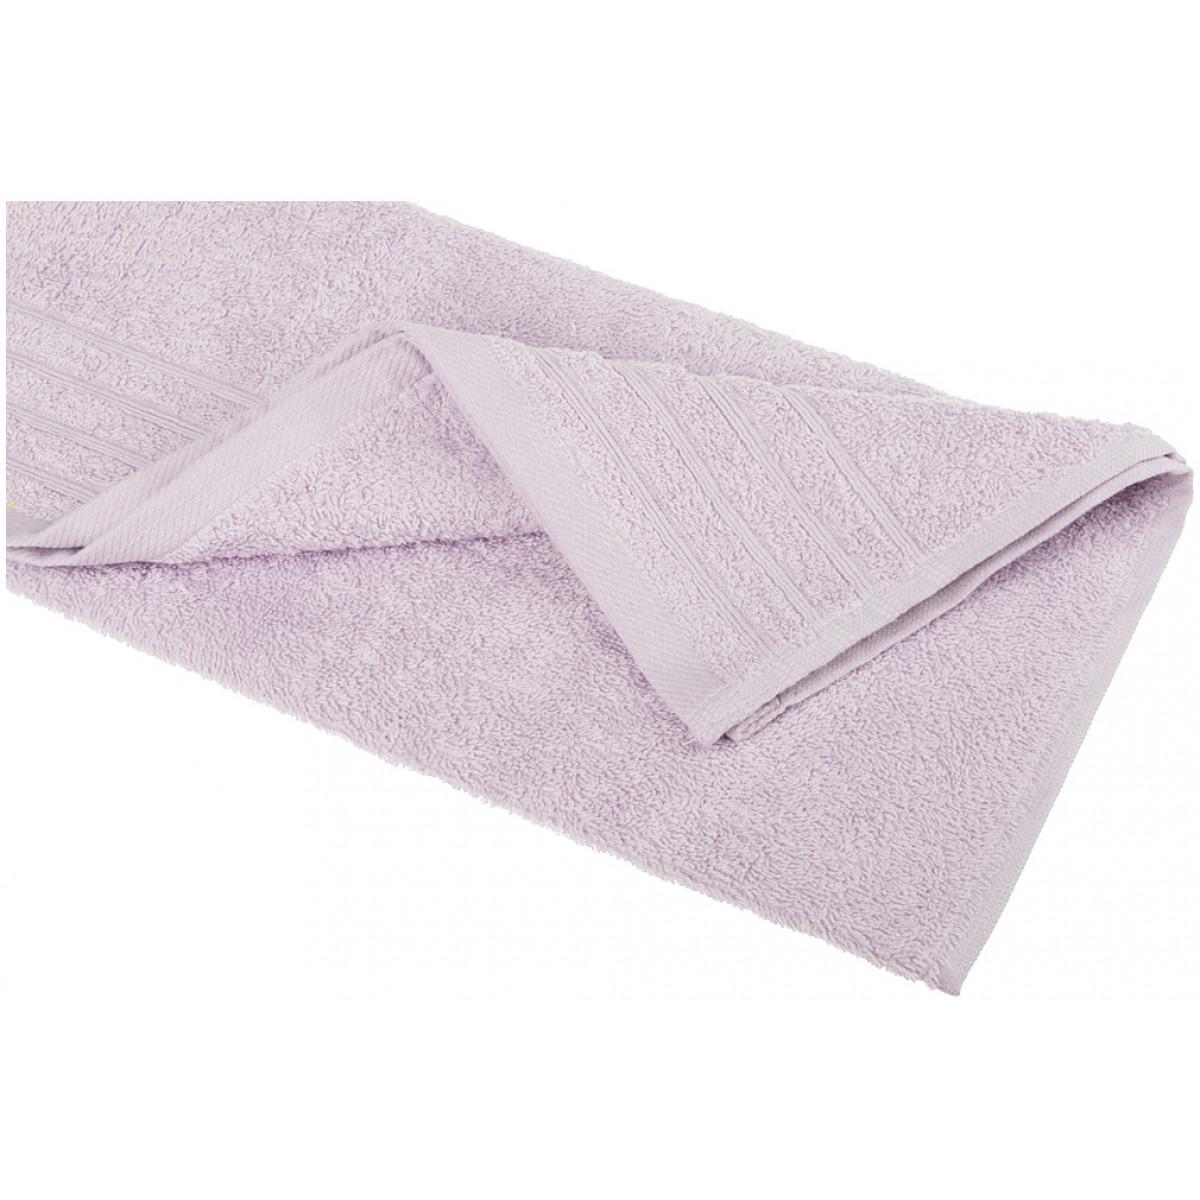 Полотенца Santalino Полотенце Maureen  (40х70 см) полотенца santalino полотенце shulamite 40х70 см